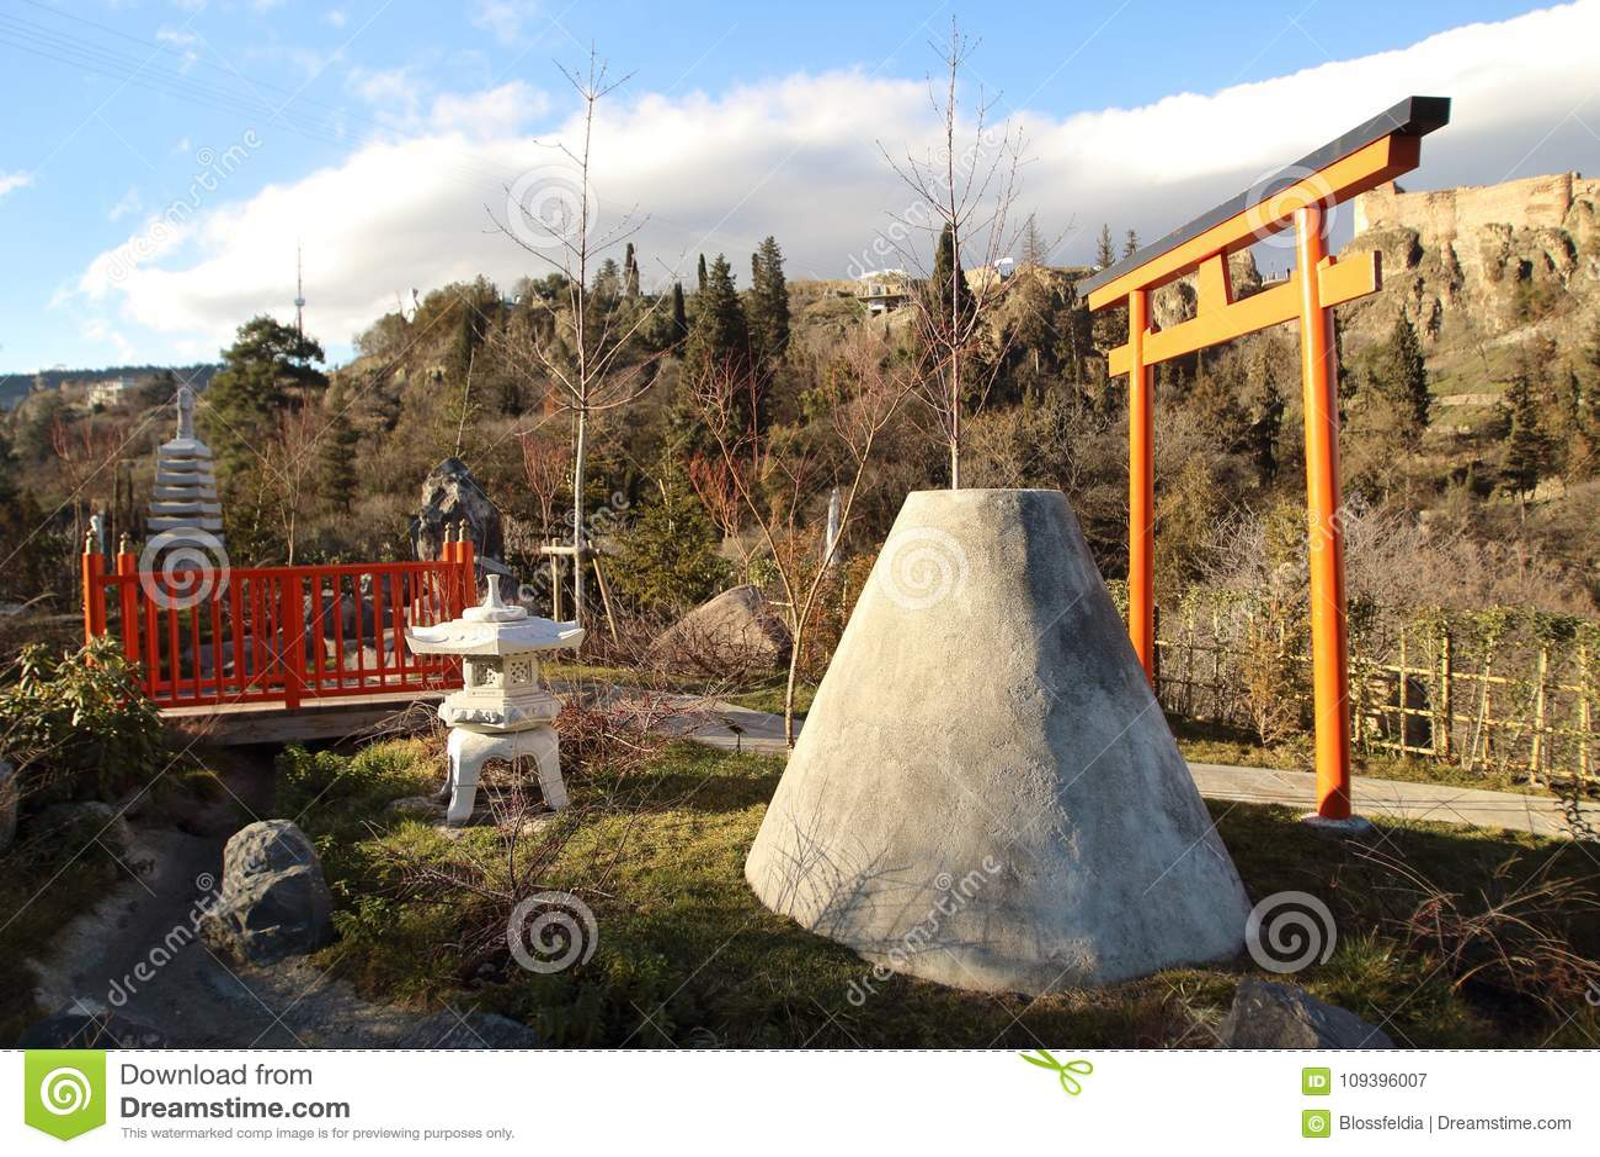 Japanese Garden In The Botanical Garden In Tbilisi City In Winter ...